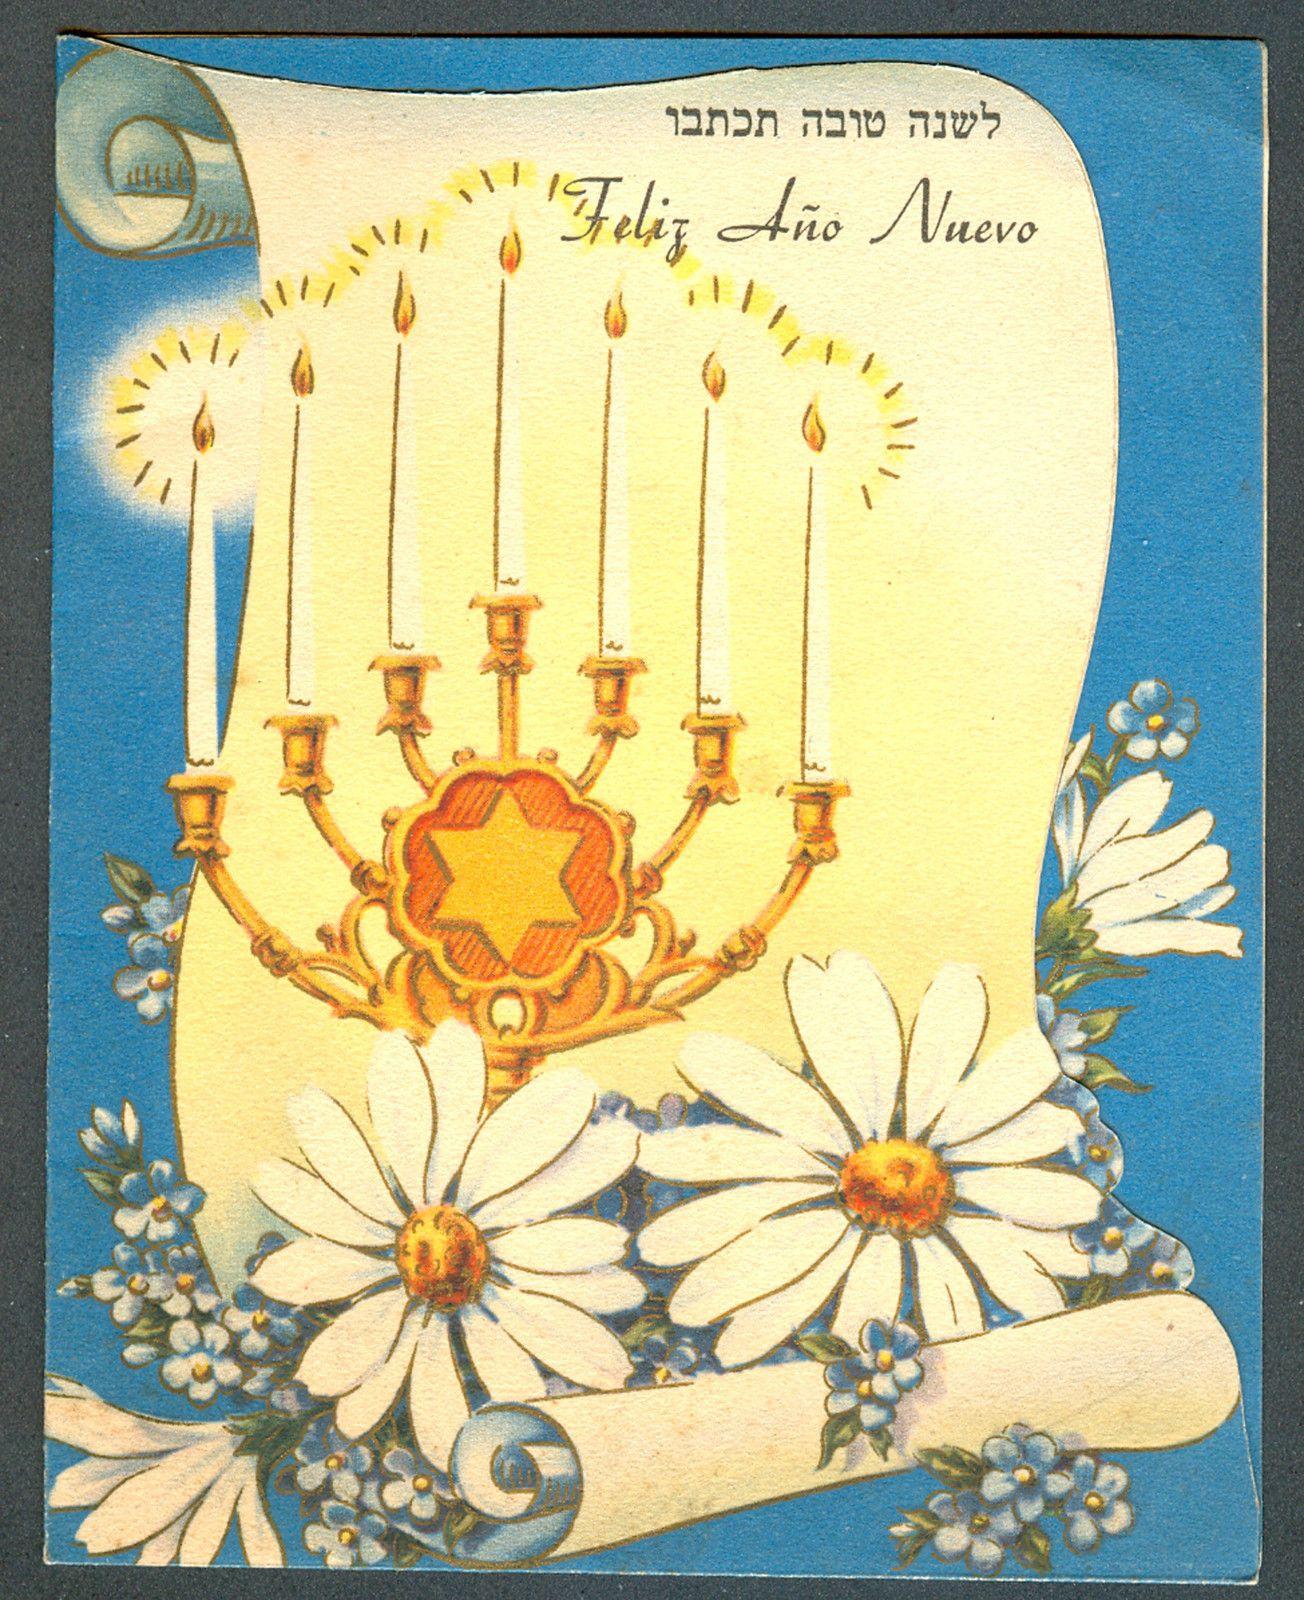 Shana tova jewish new year greeting card with love the jewish new year greeting card with love kristyandbryce Images